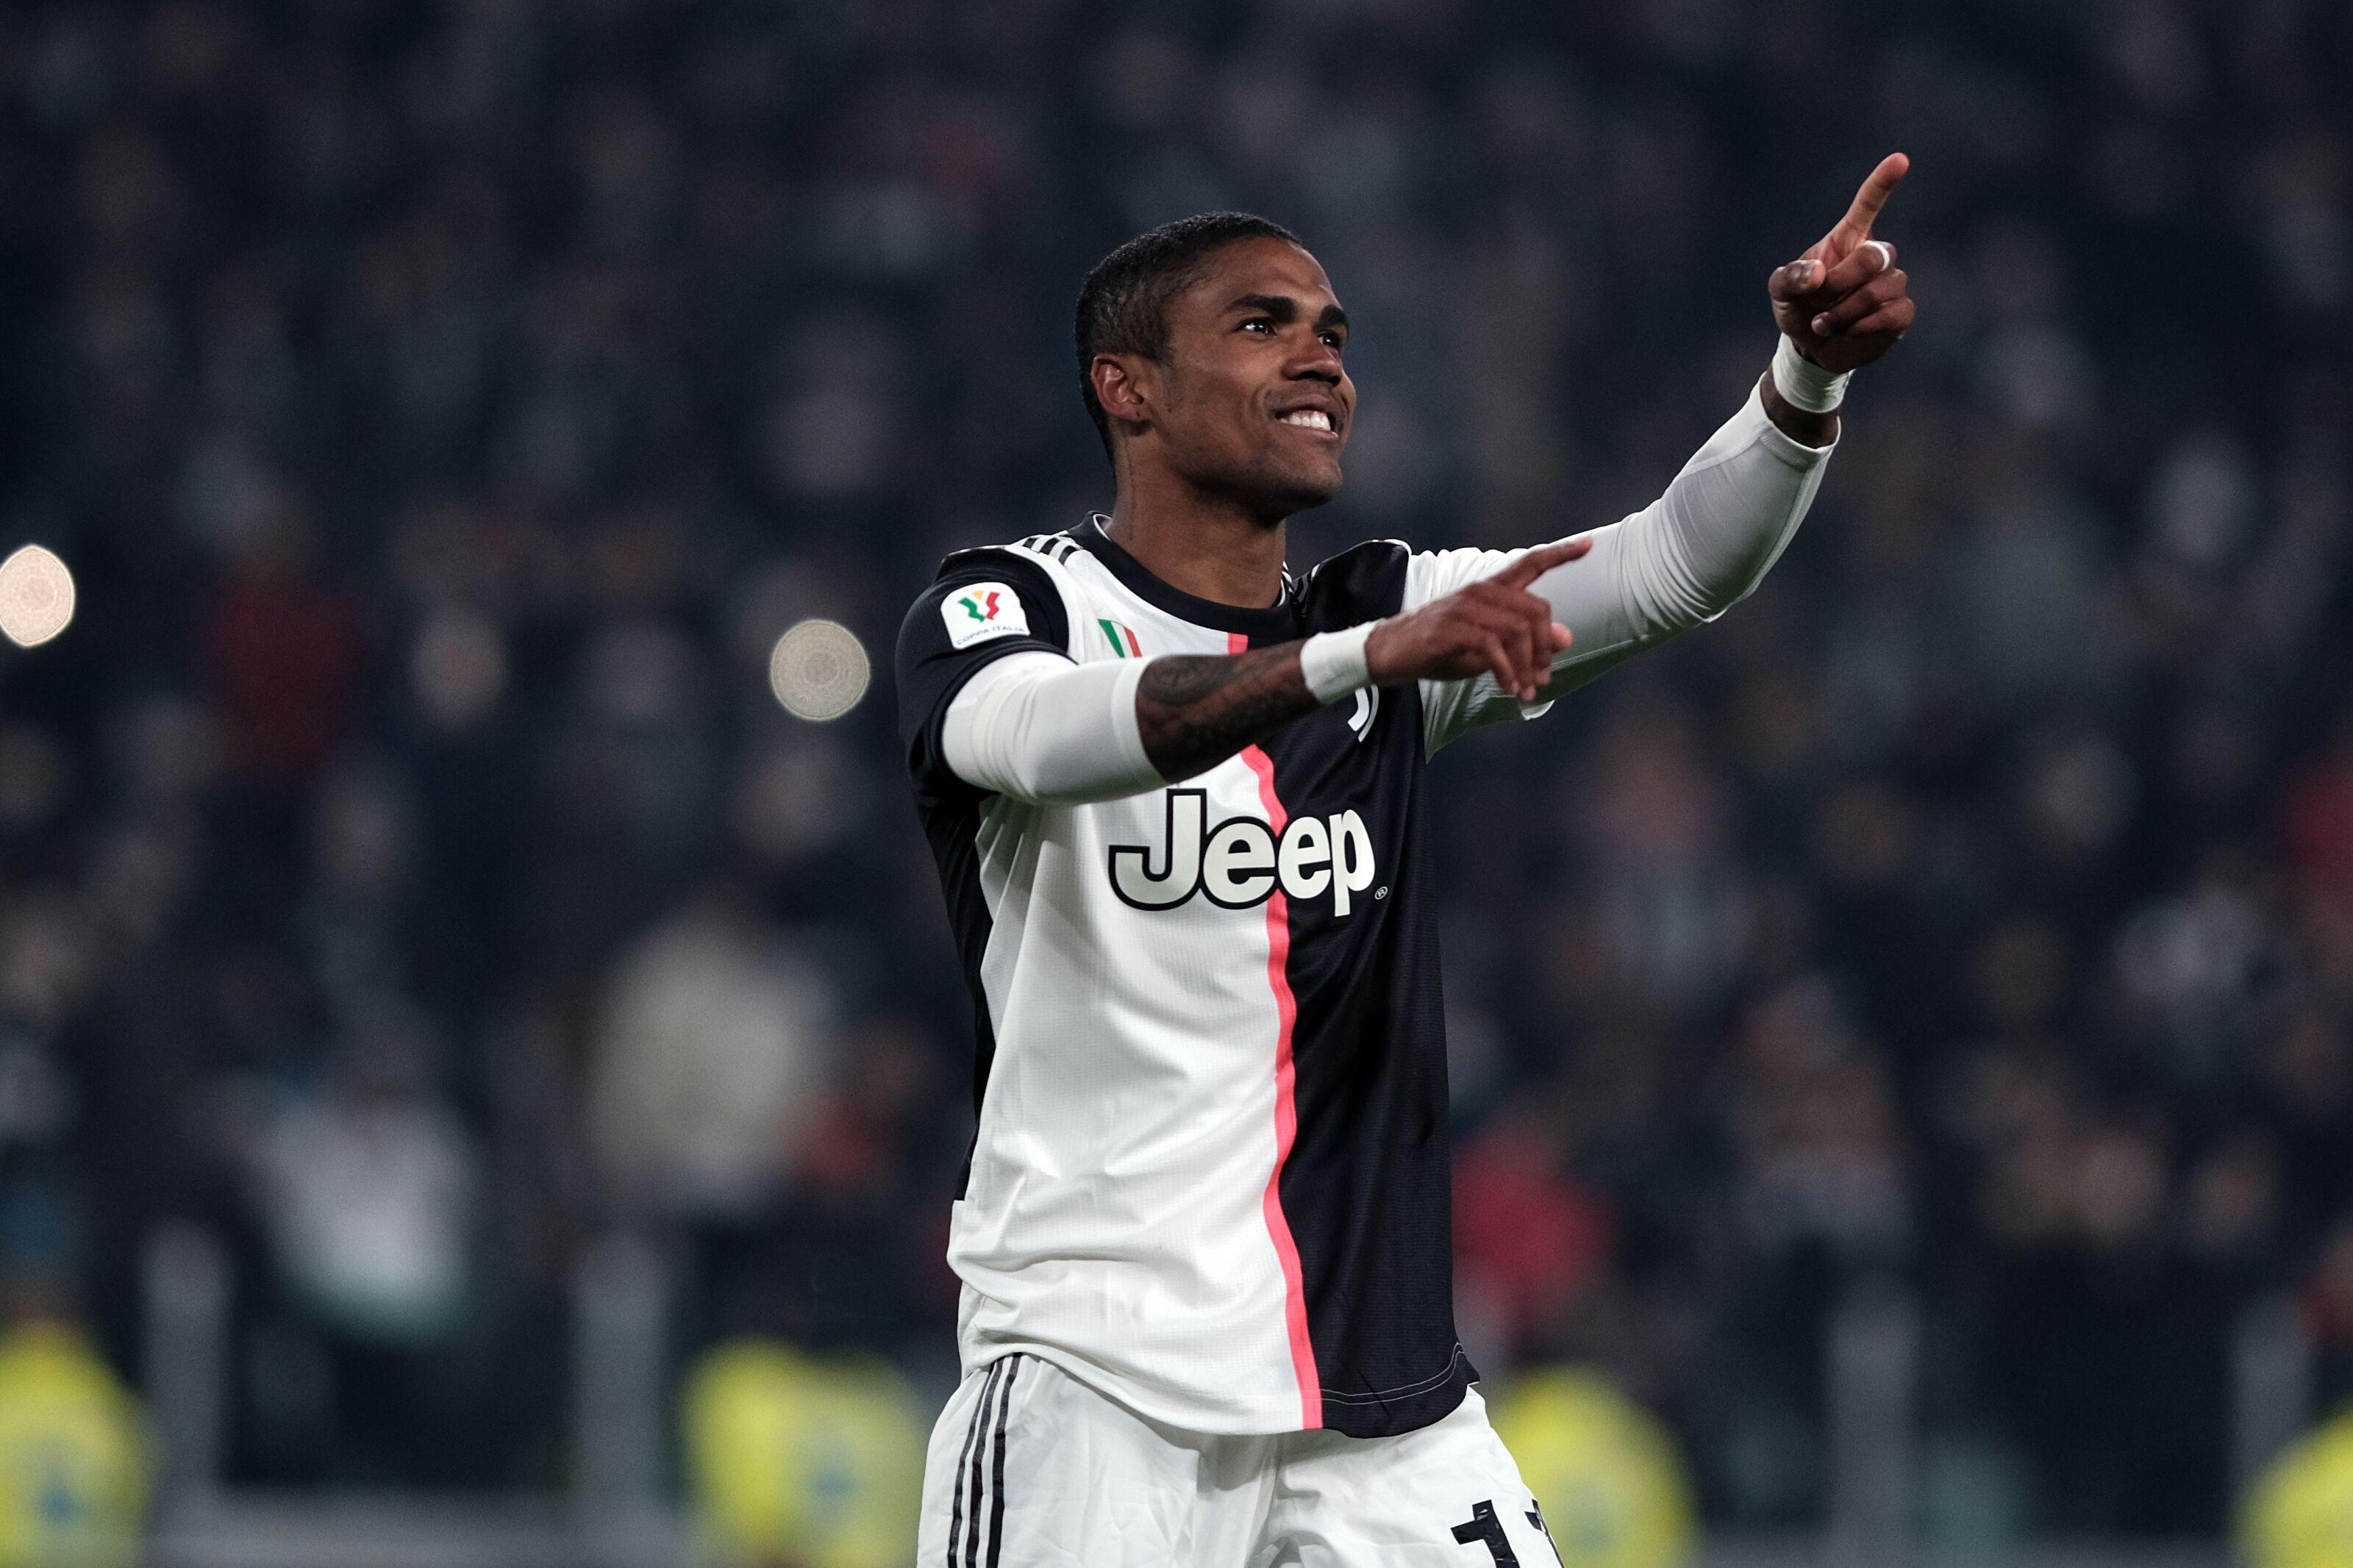 Bayern Munich reportedly exploring a move for Douglas Costa